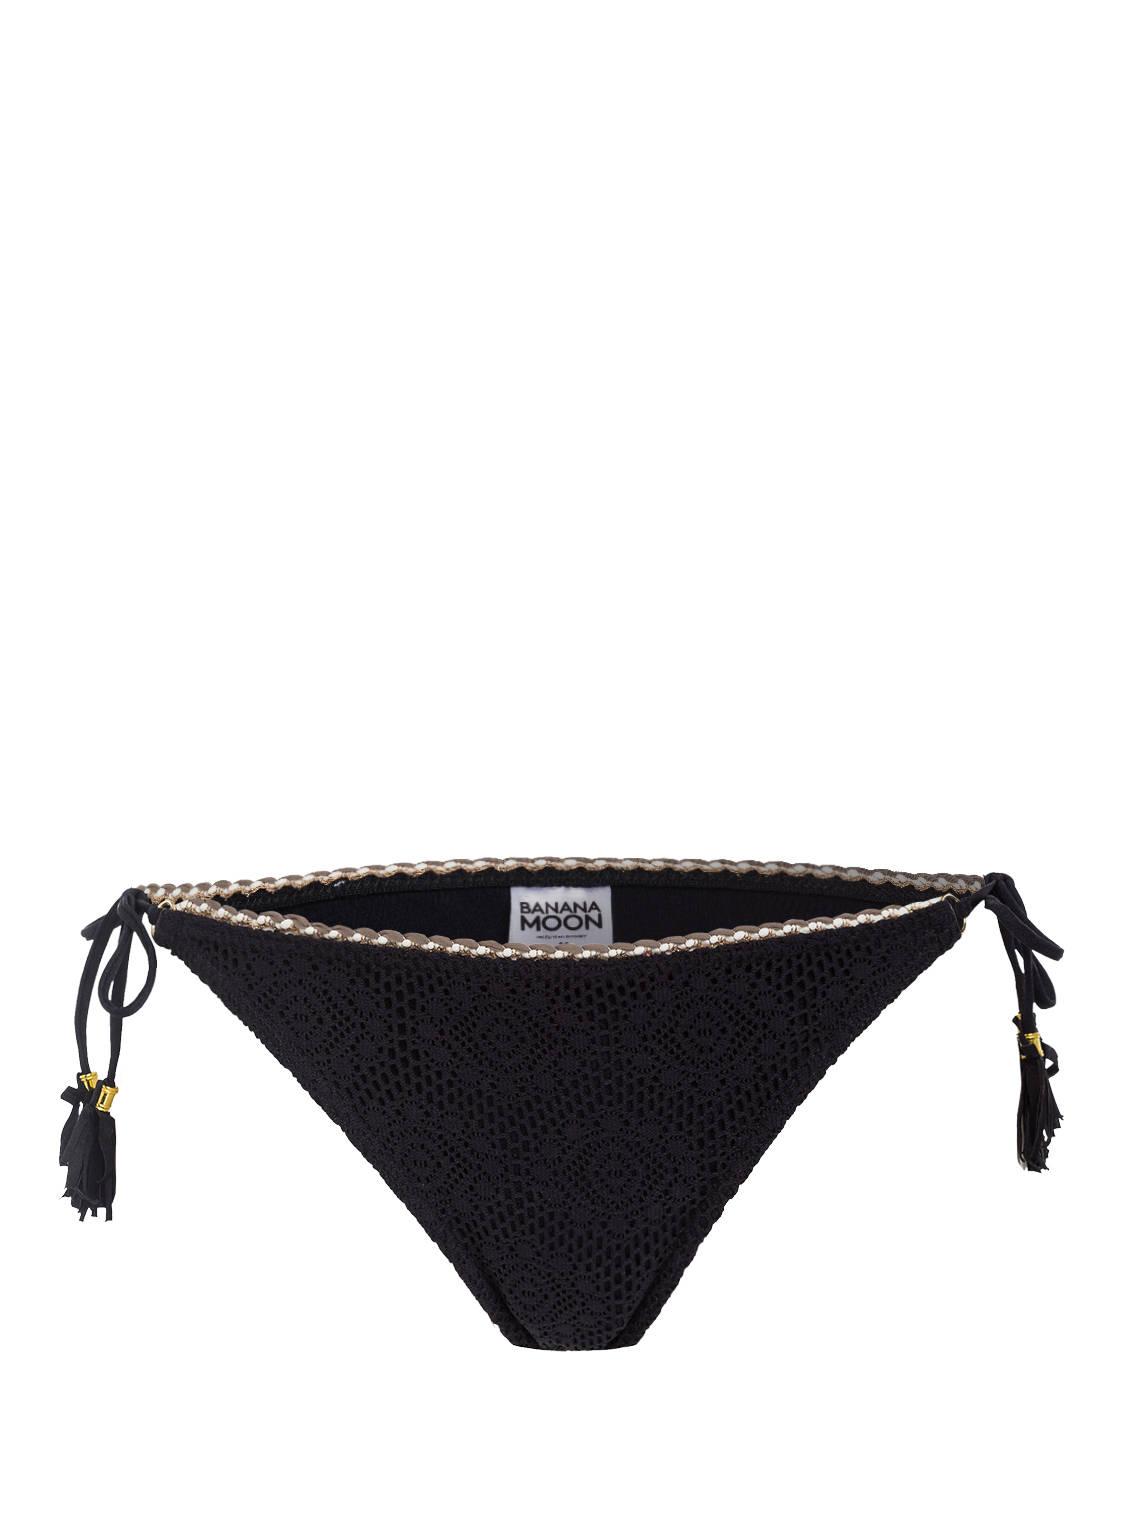 Image of Banana Moon Couture Bikini-Hose Galbia Crochet schwarz